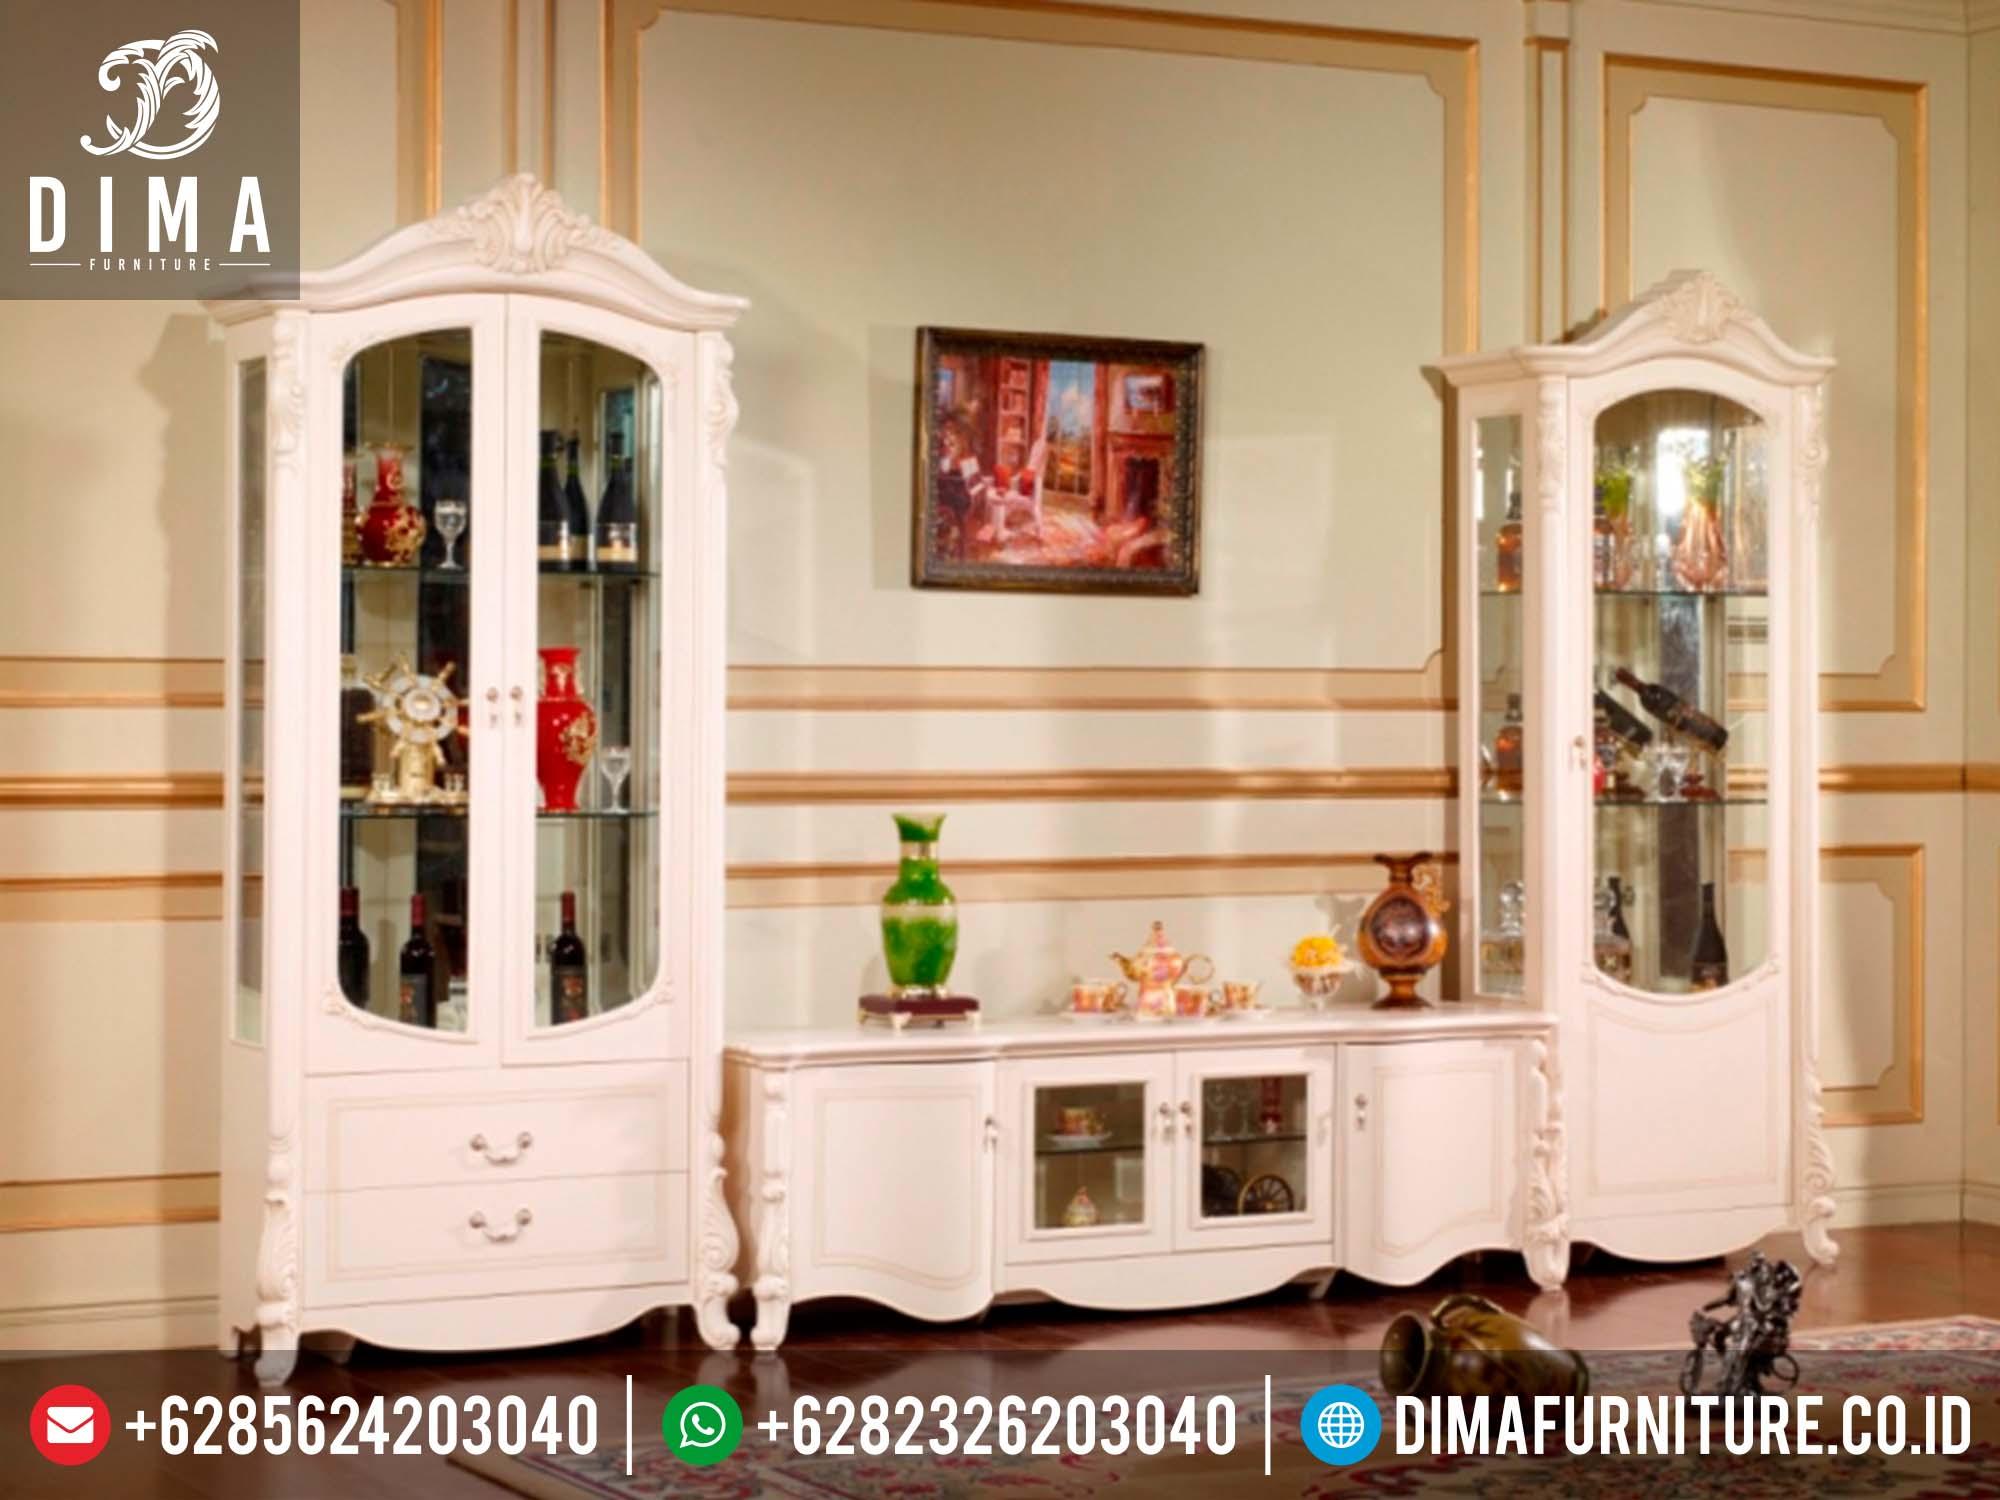 Set Buffet TV Minimalis Klasik, Lemari Hias Minimalis Jati Jepara, Set Bufet TV Minimalis Mewah Terbaru DF-0135